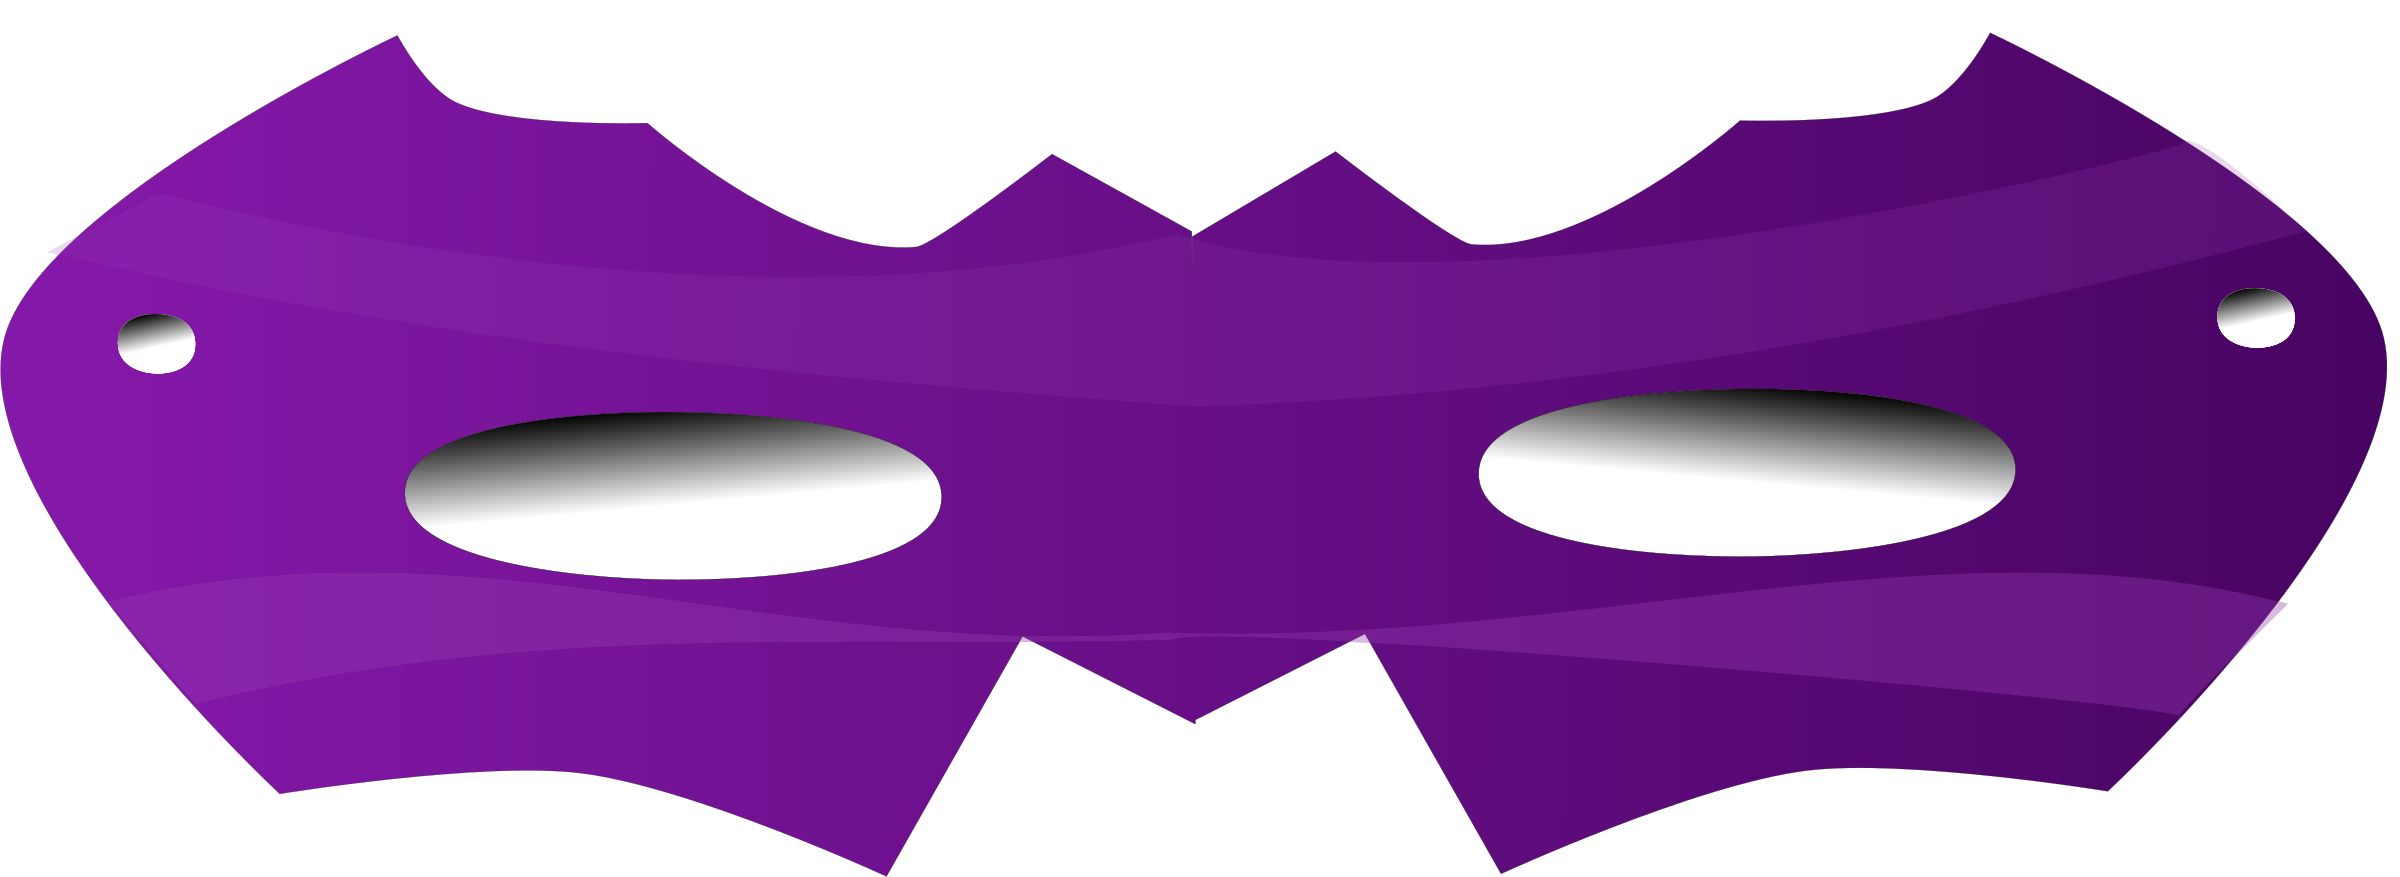 Halloween eye mask clipart image library stock Clipart - eye mask image library stock